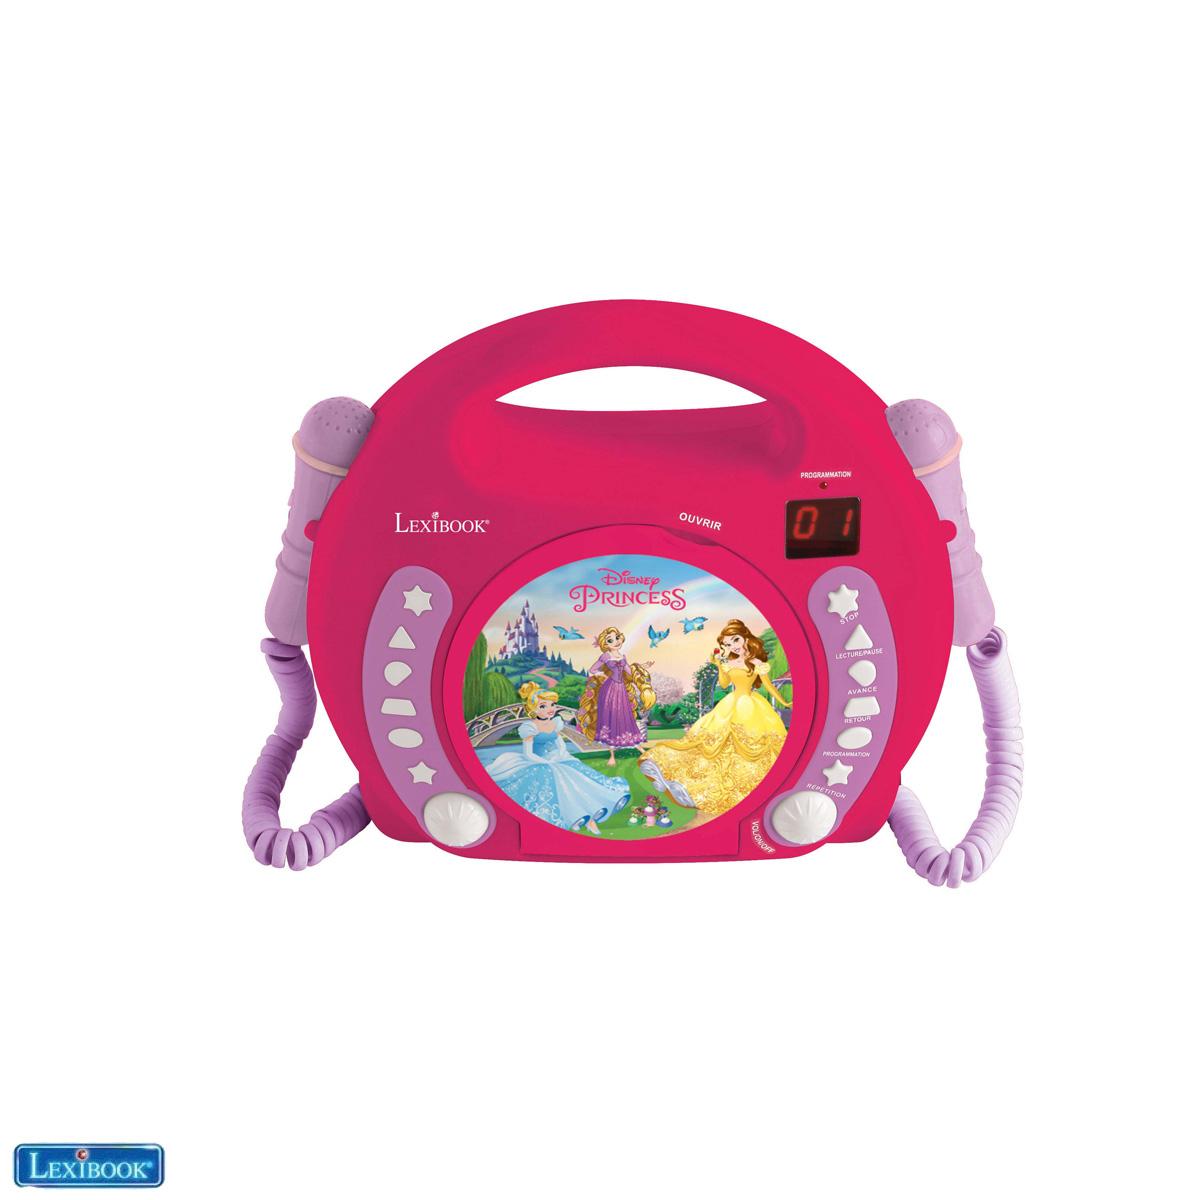 Lexibook - Disney Princess Portable CD player with 2 Sing Along microphones (RCDK100DP)